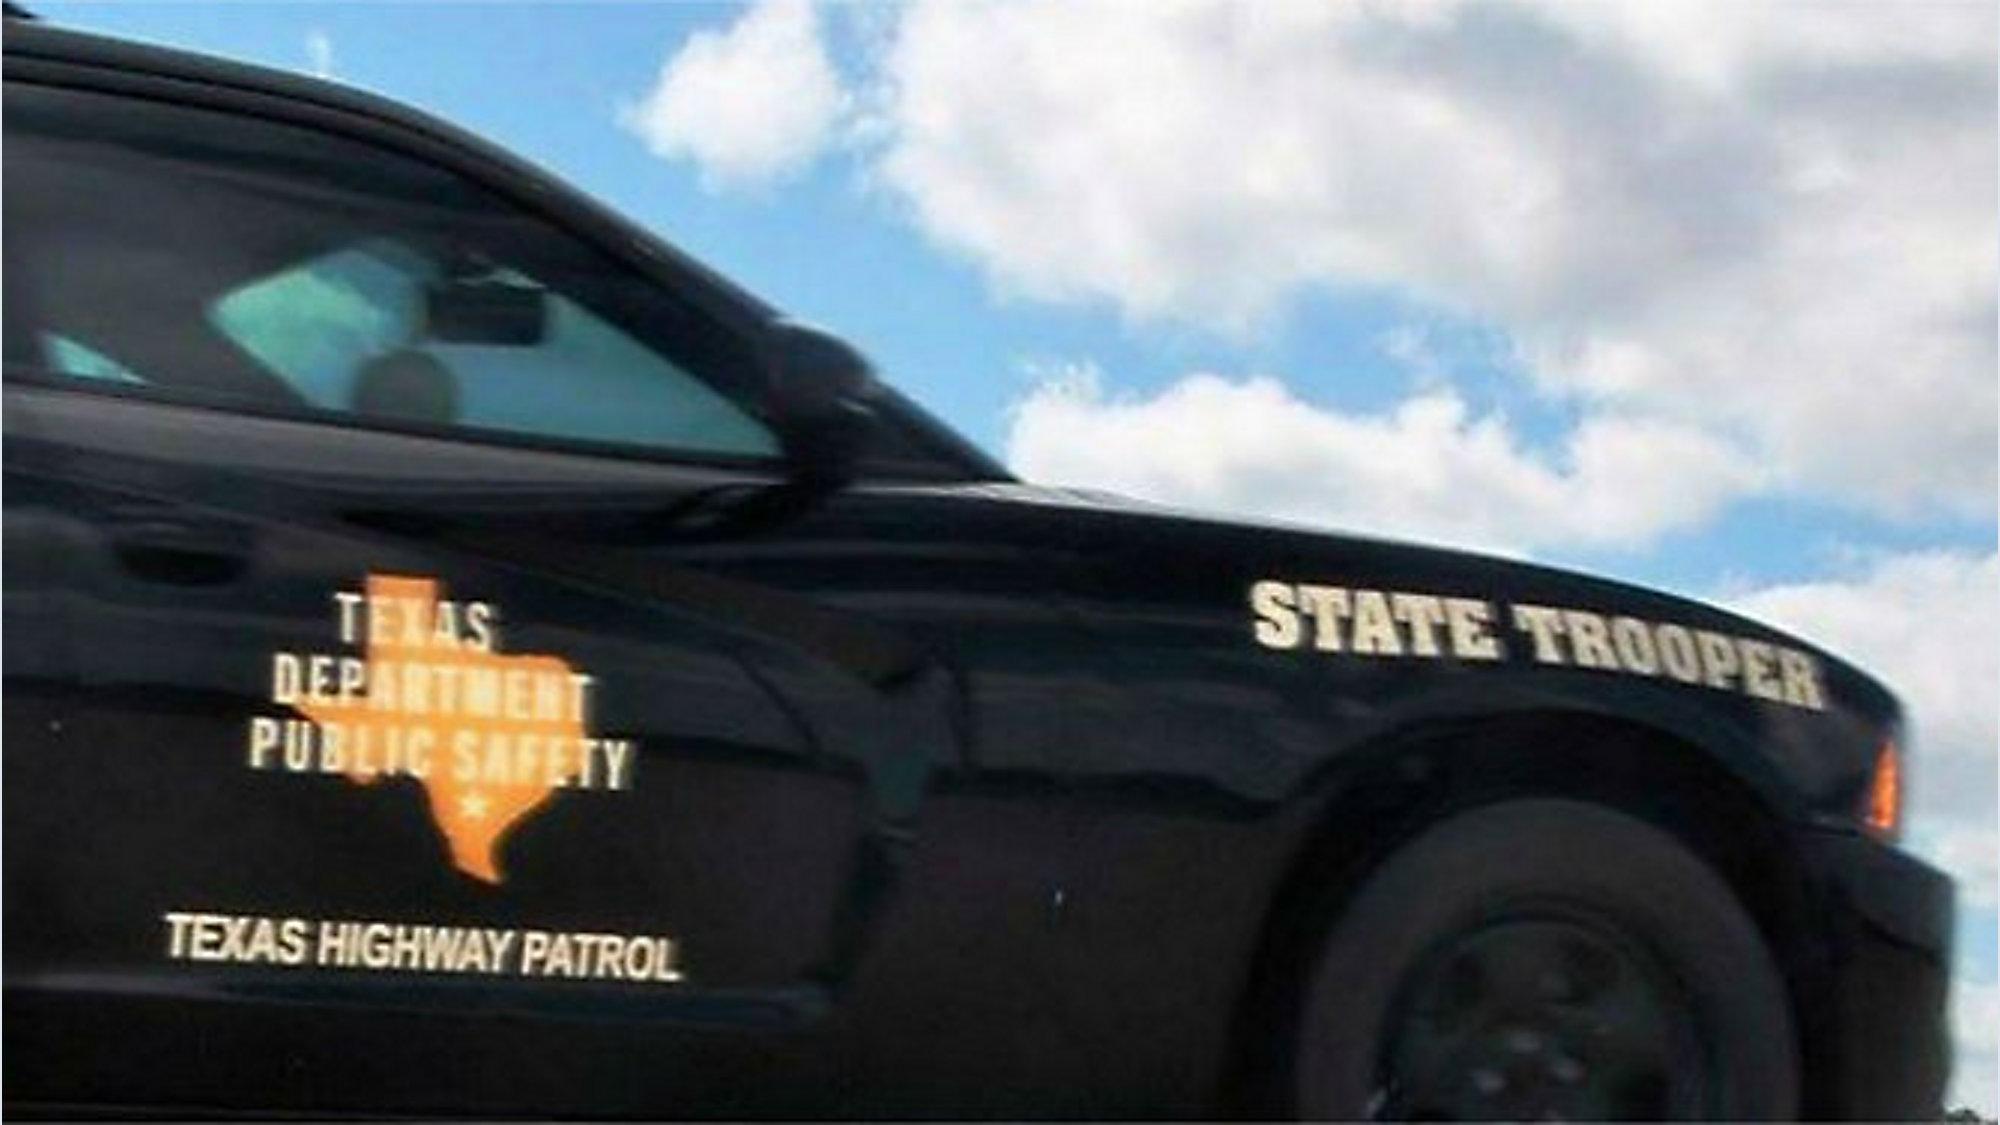 Unworn seatbelt leads to drug bust in Texas Panhandle